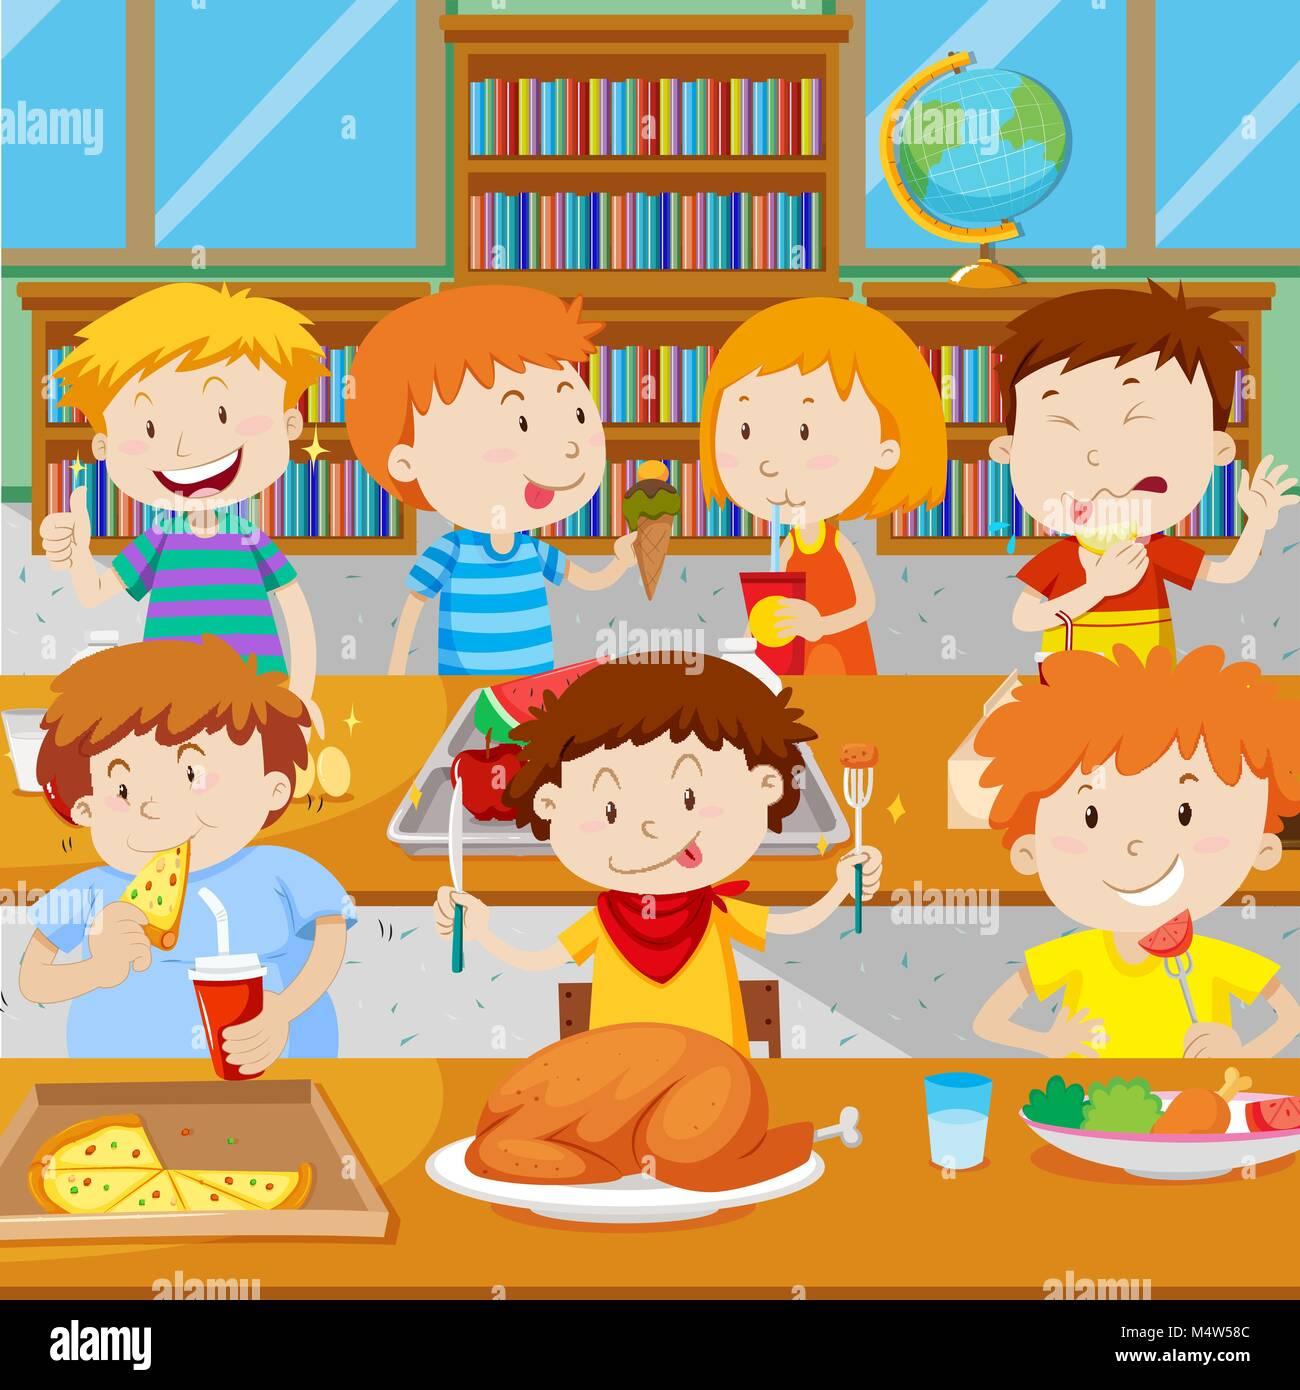 school canteen stock vector images - alamy